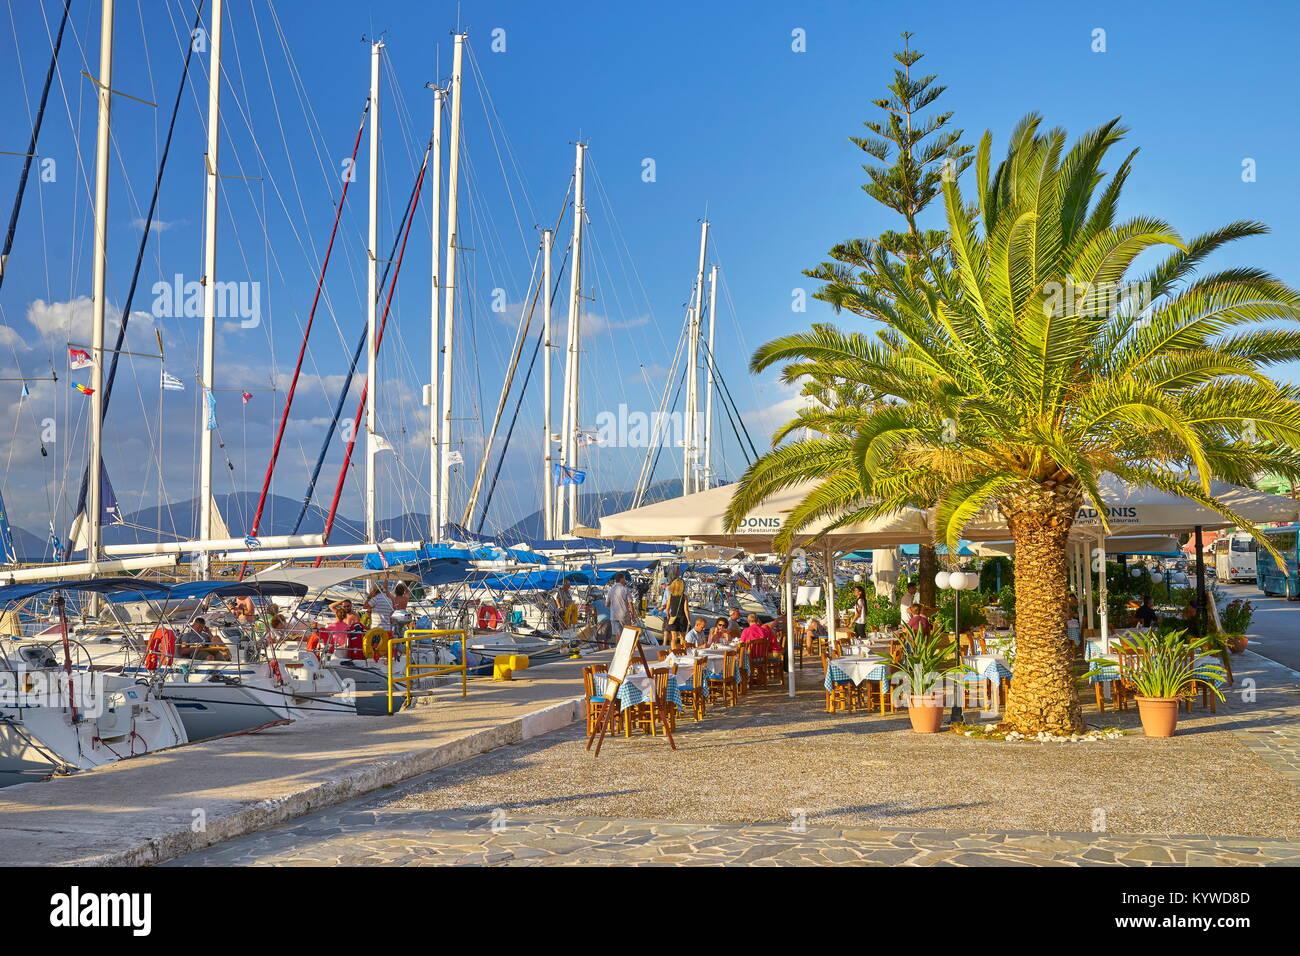 Marina at Sami village, Kefalonia Island, Greece - Stock Image